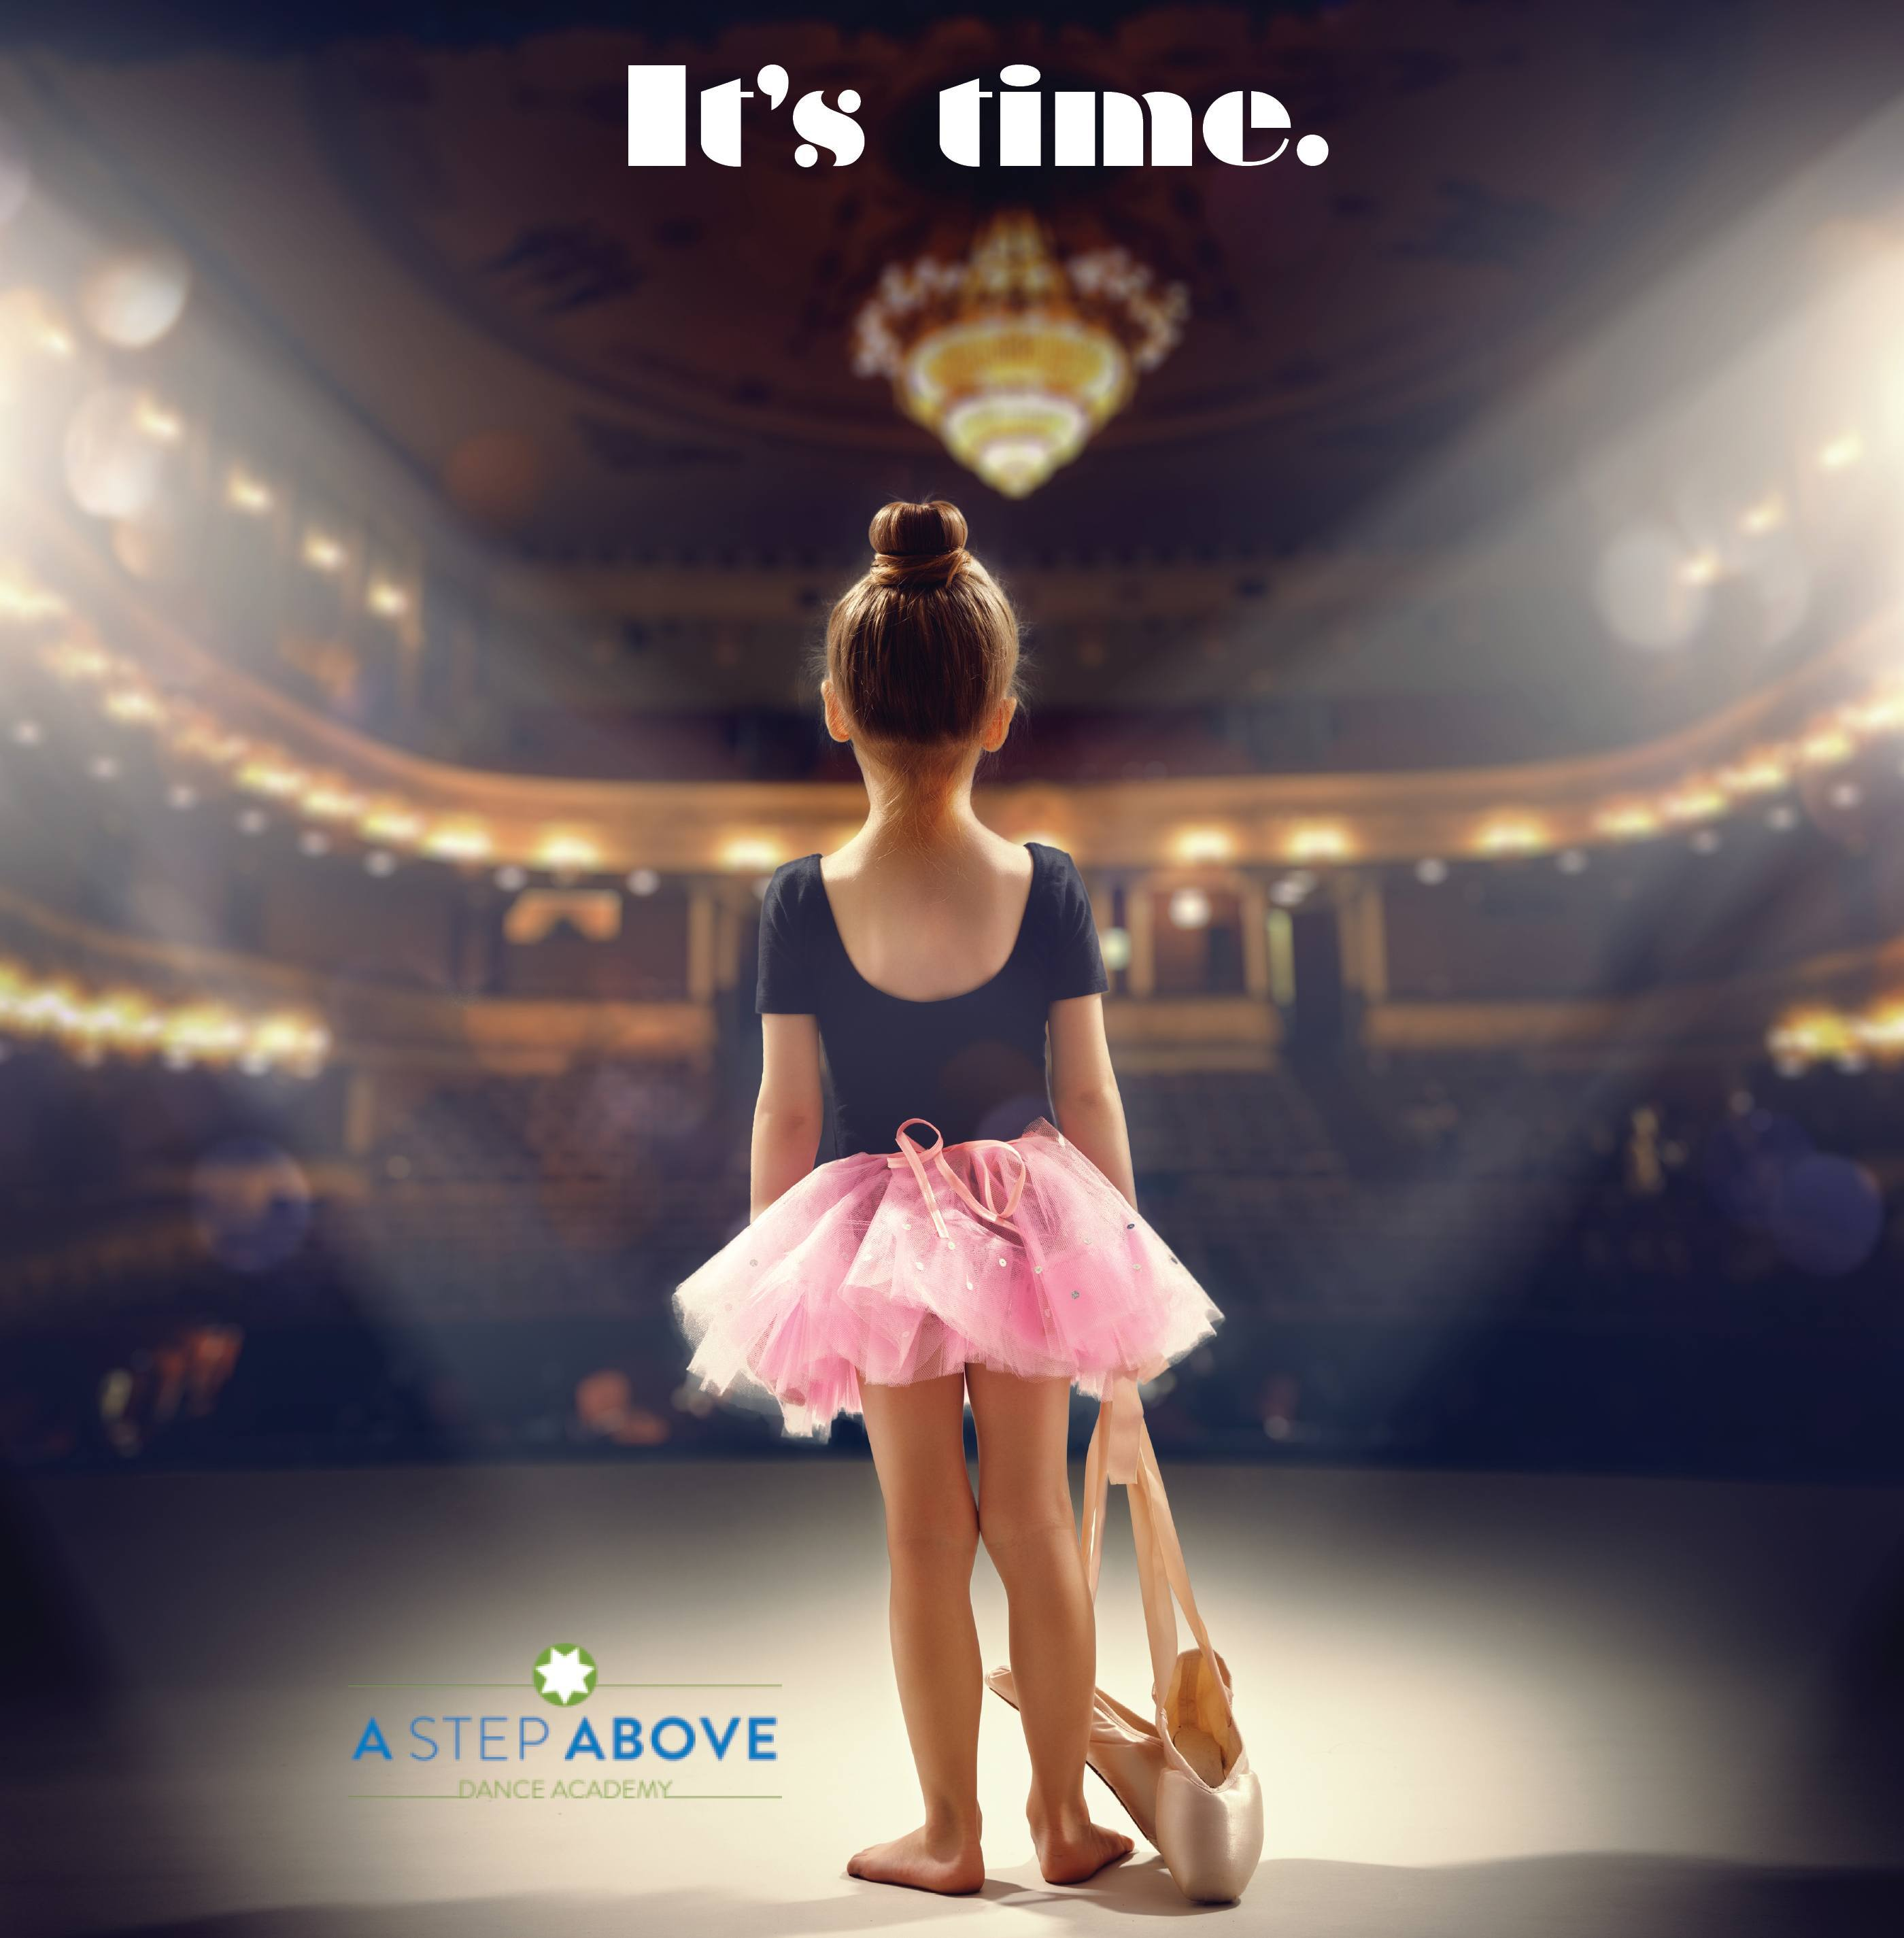 Dance Recital Planning Checklist - A Step Above Dance Academy